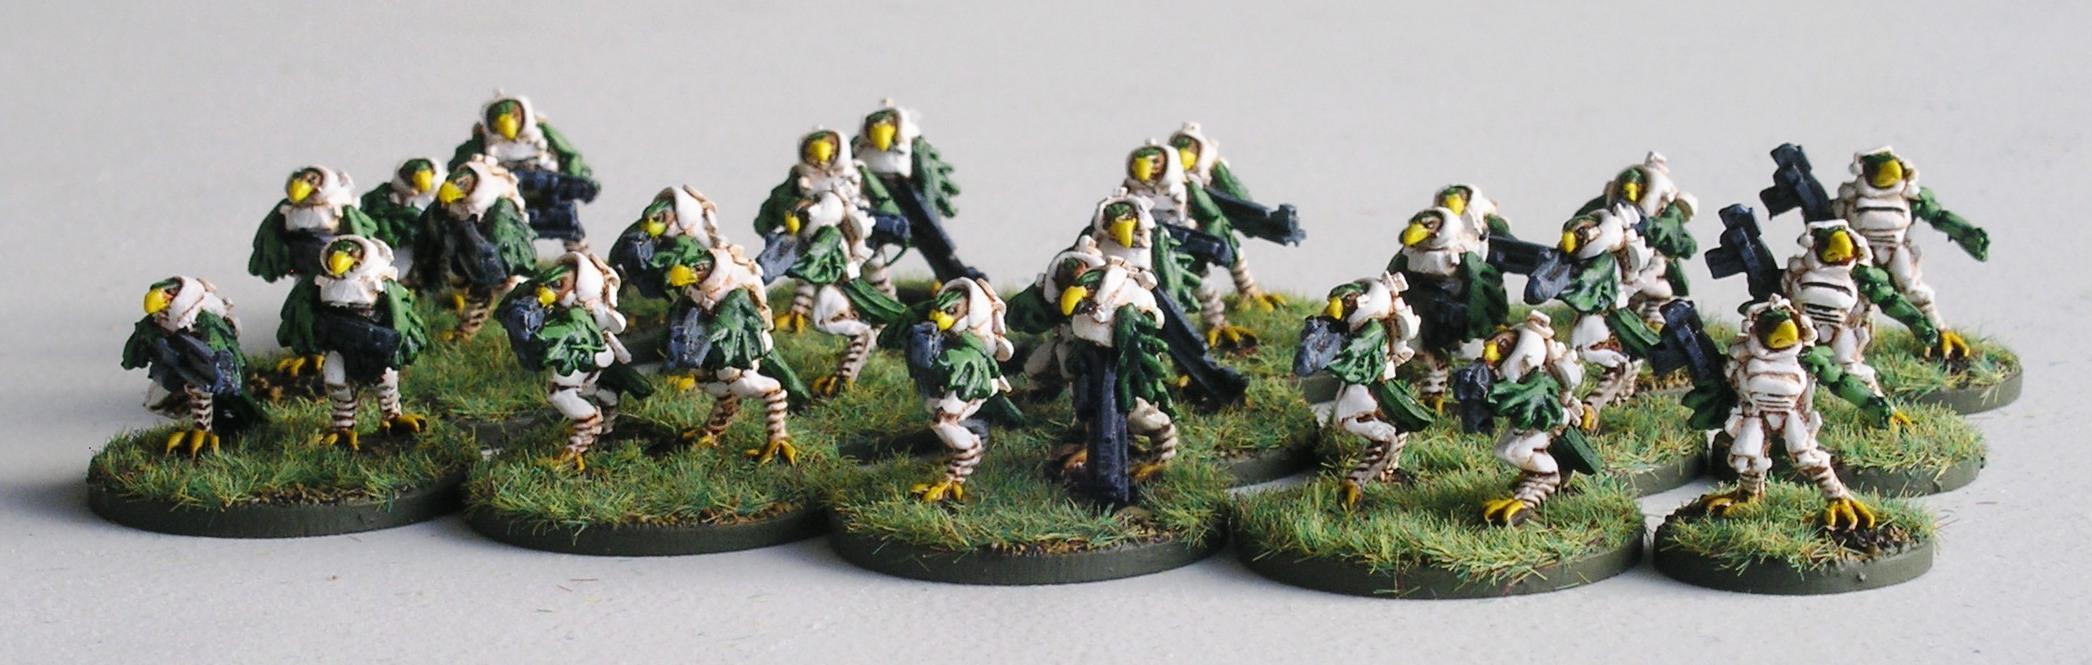 1st (Hauk) Airmobile Platoon